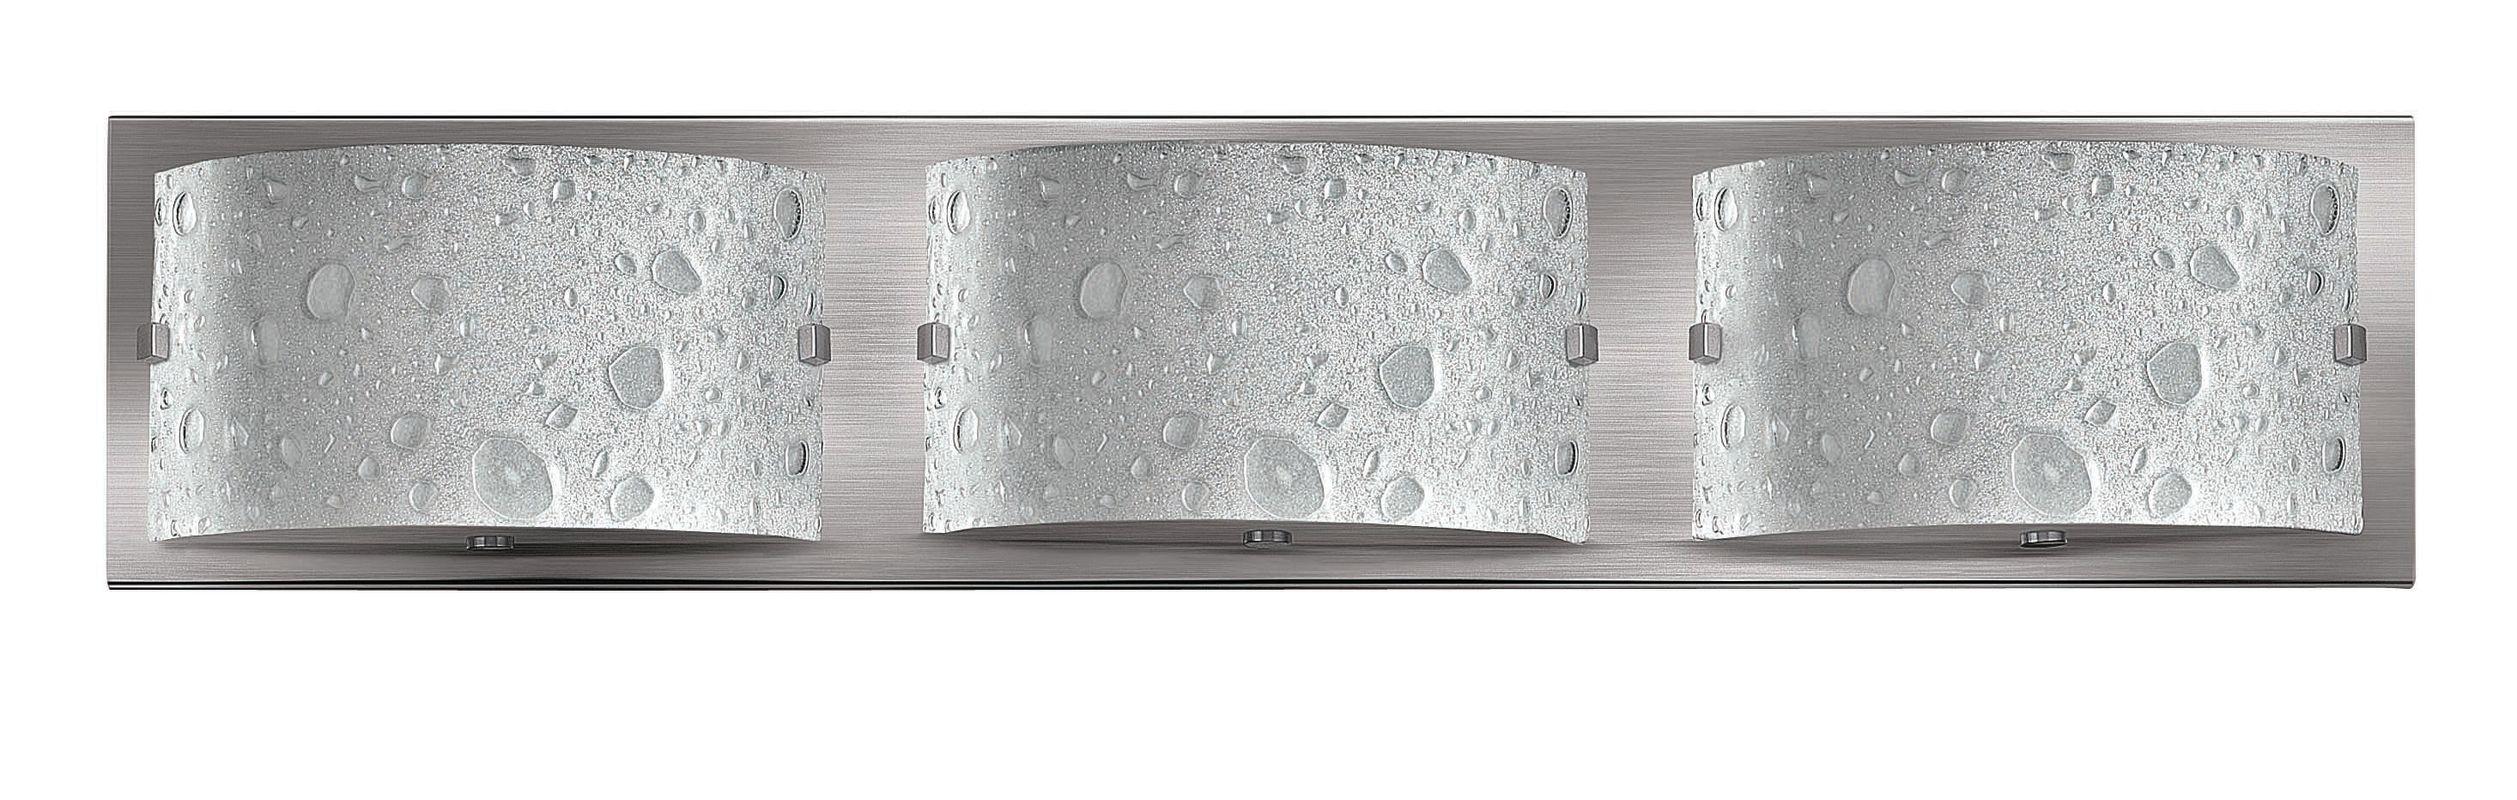 Hinkley 5923BN-LED2 Brushed Nickel Contemporary Daphne Bathroom Light